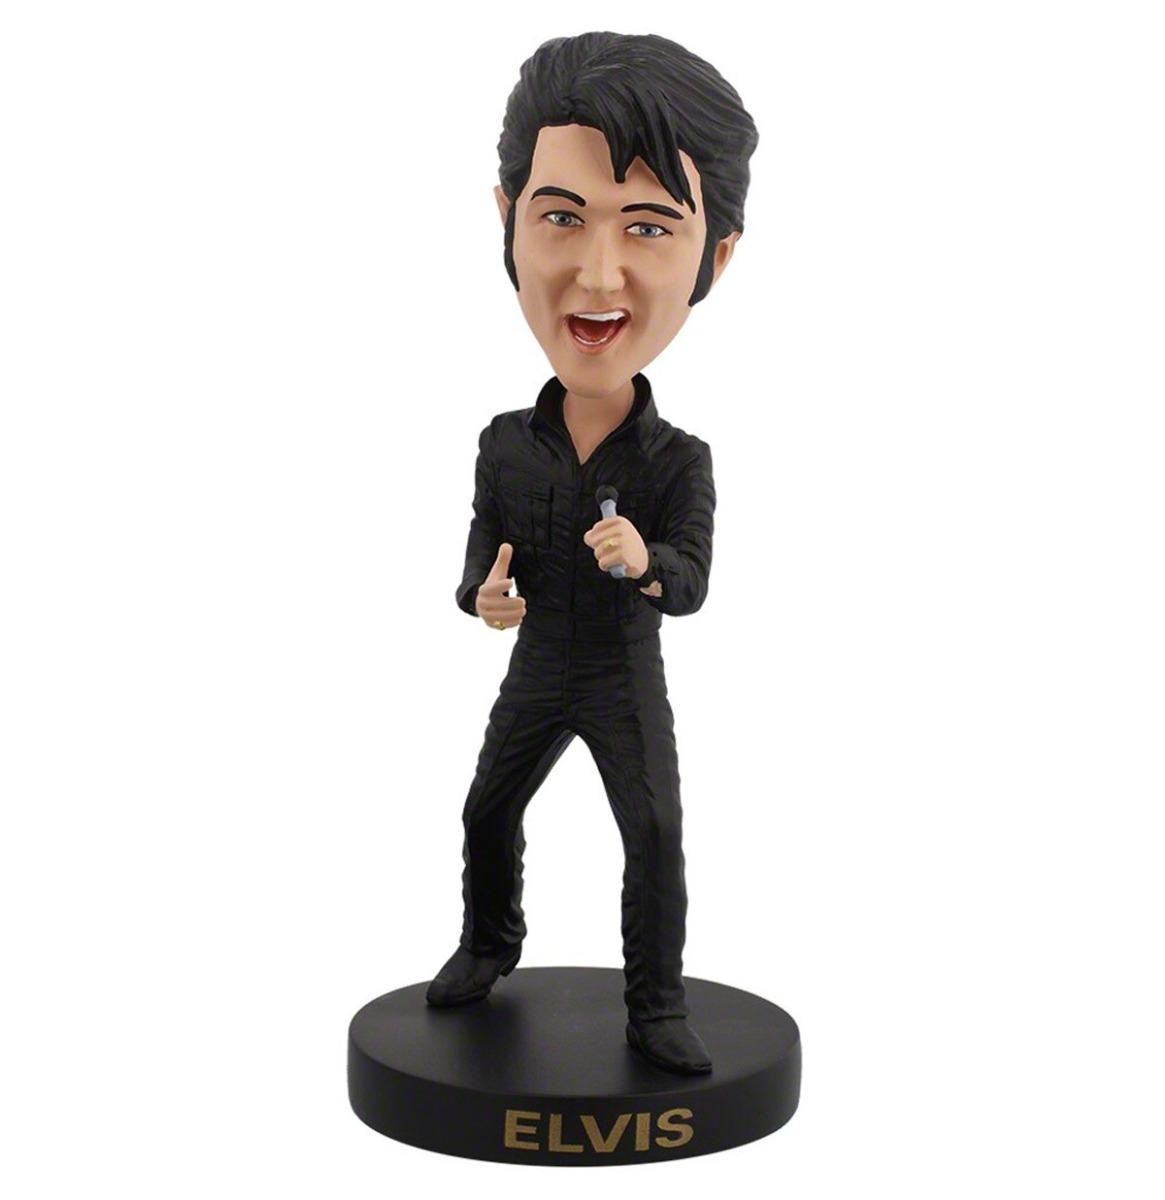 Elvis: Black Leather Suit - '68 Comeback Bobblehead